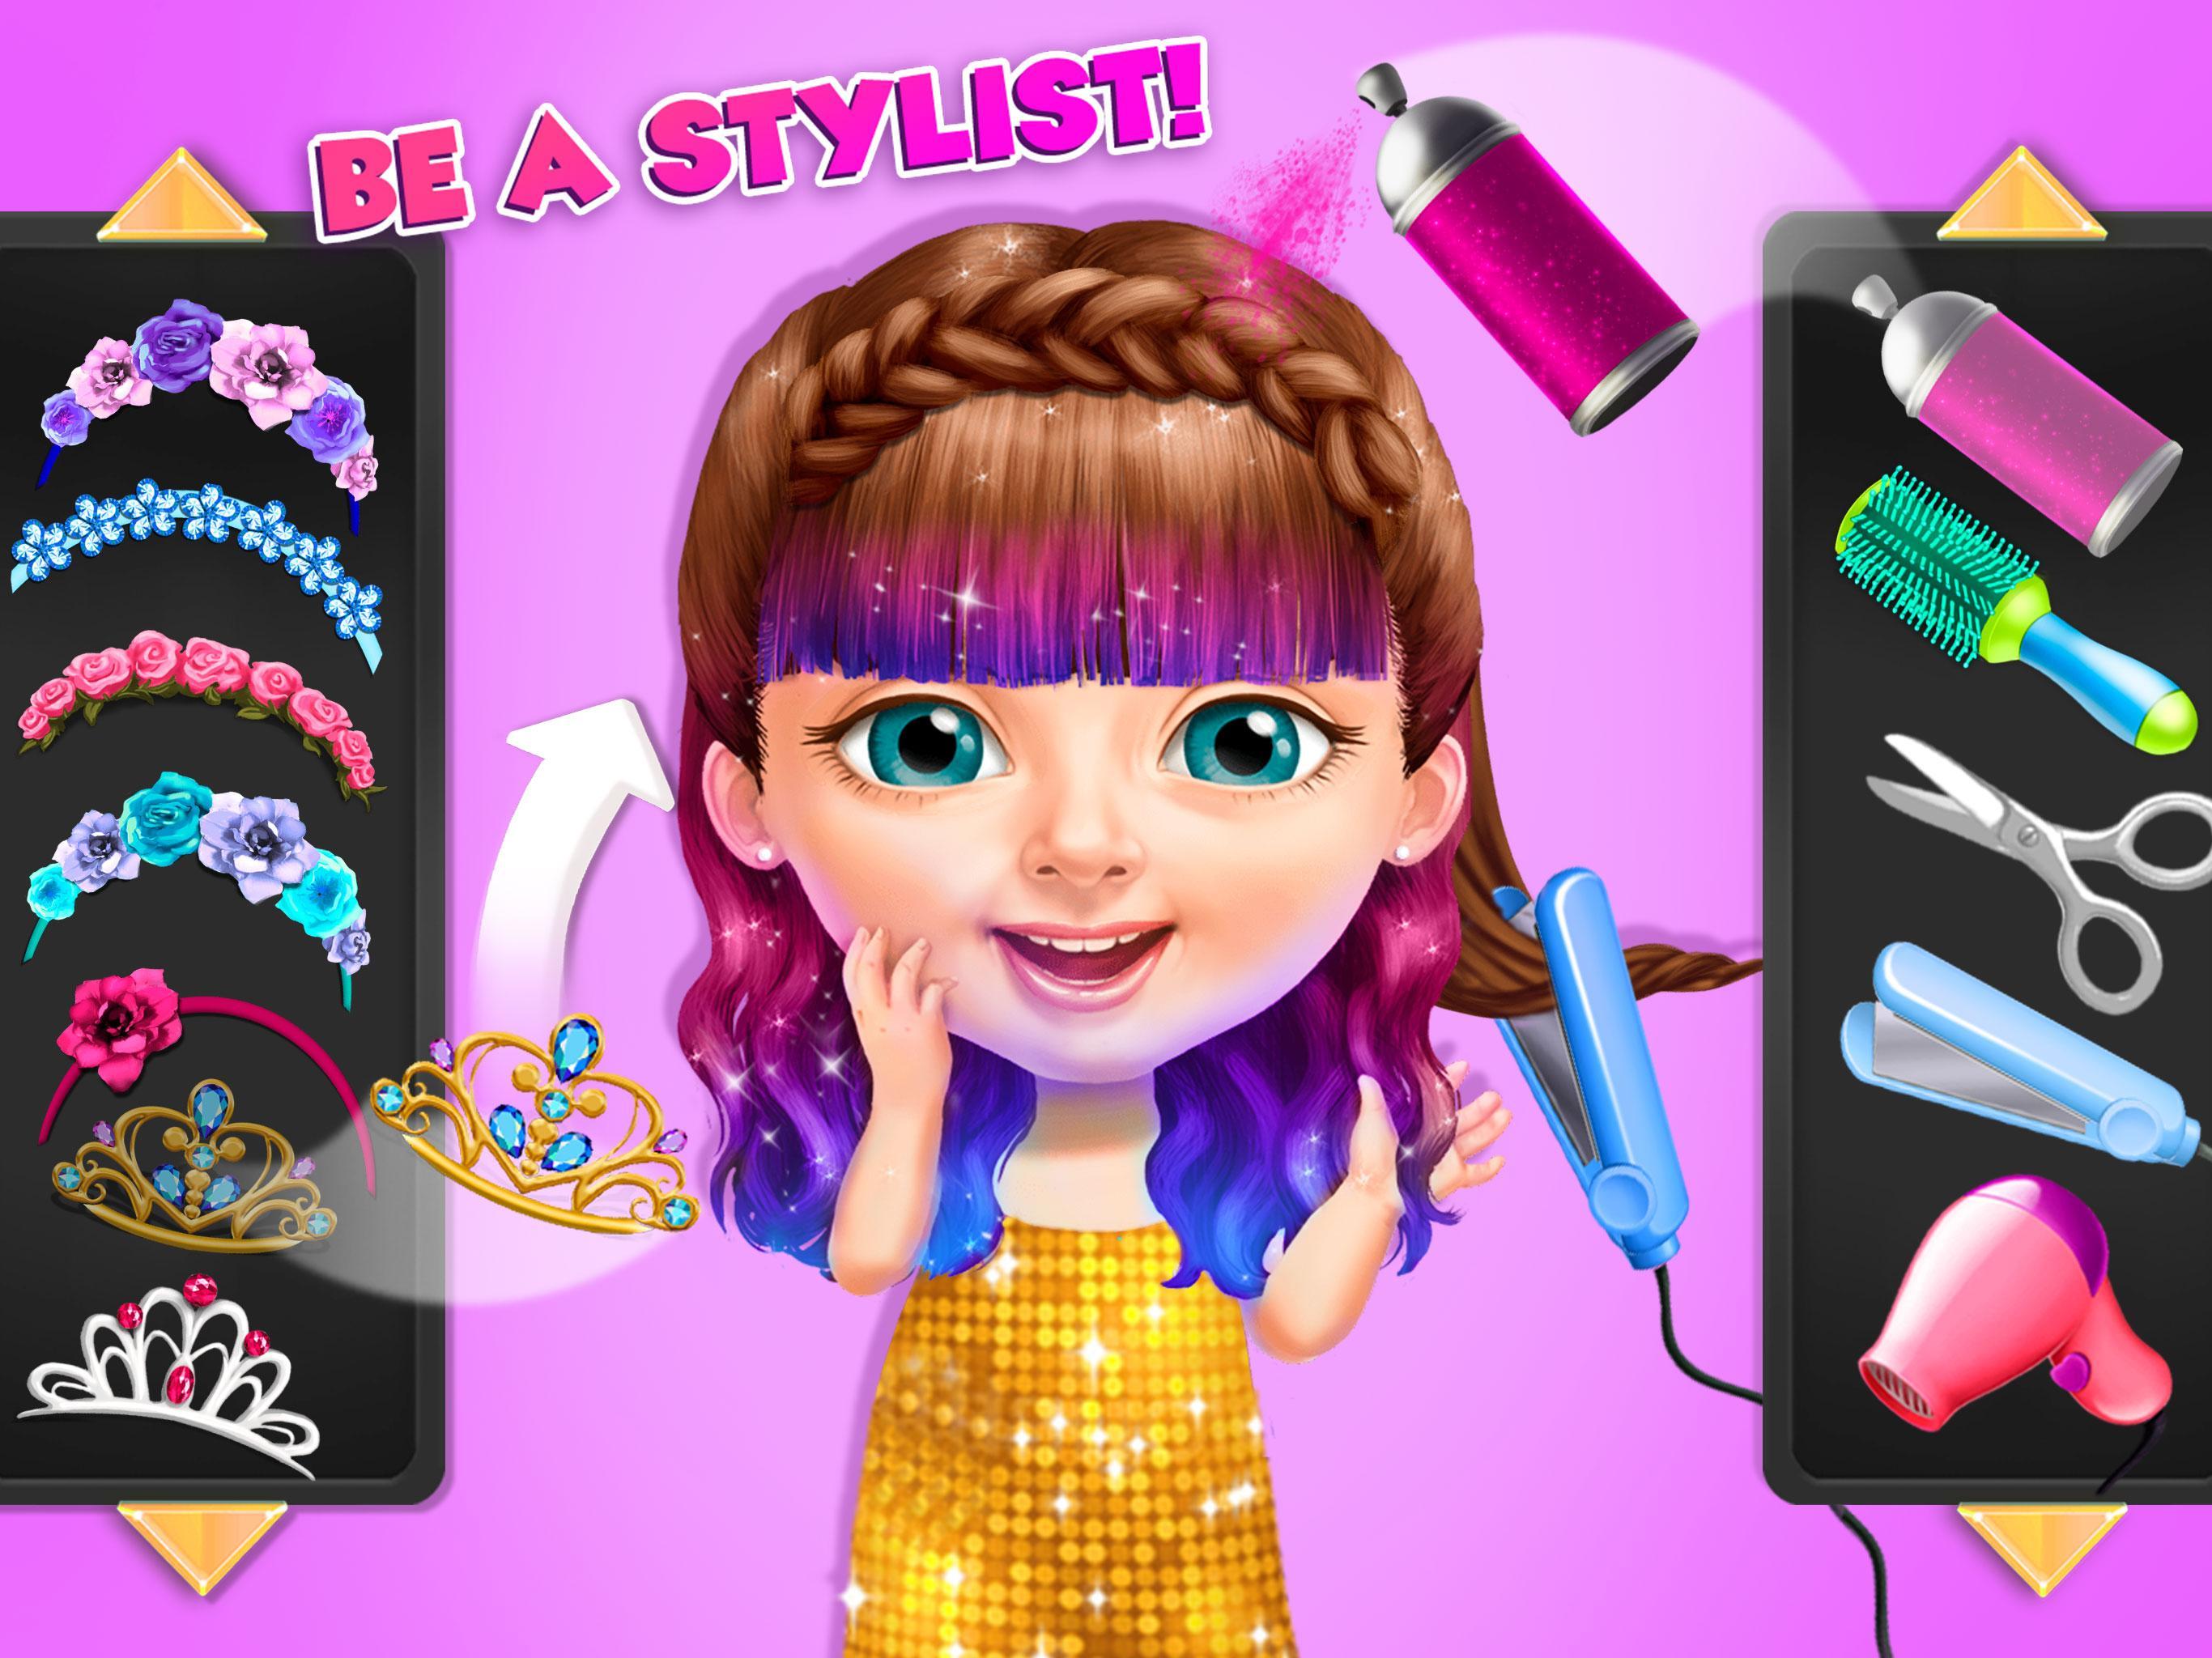 Sweet Baby Girl Summer Fun 2 - Sunny Makeover Game APK 7.0